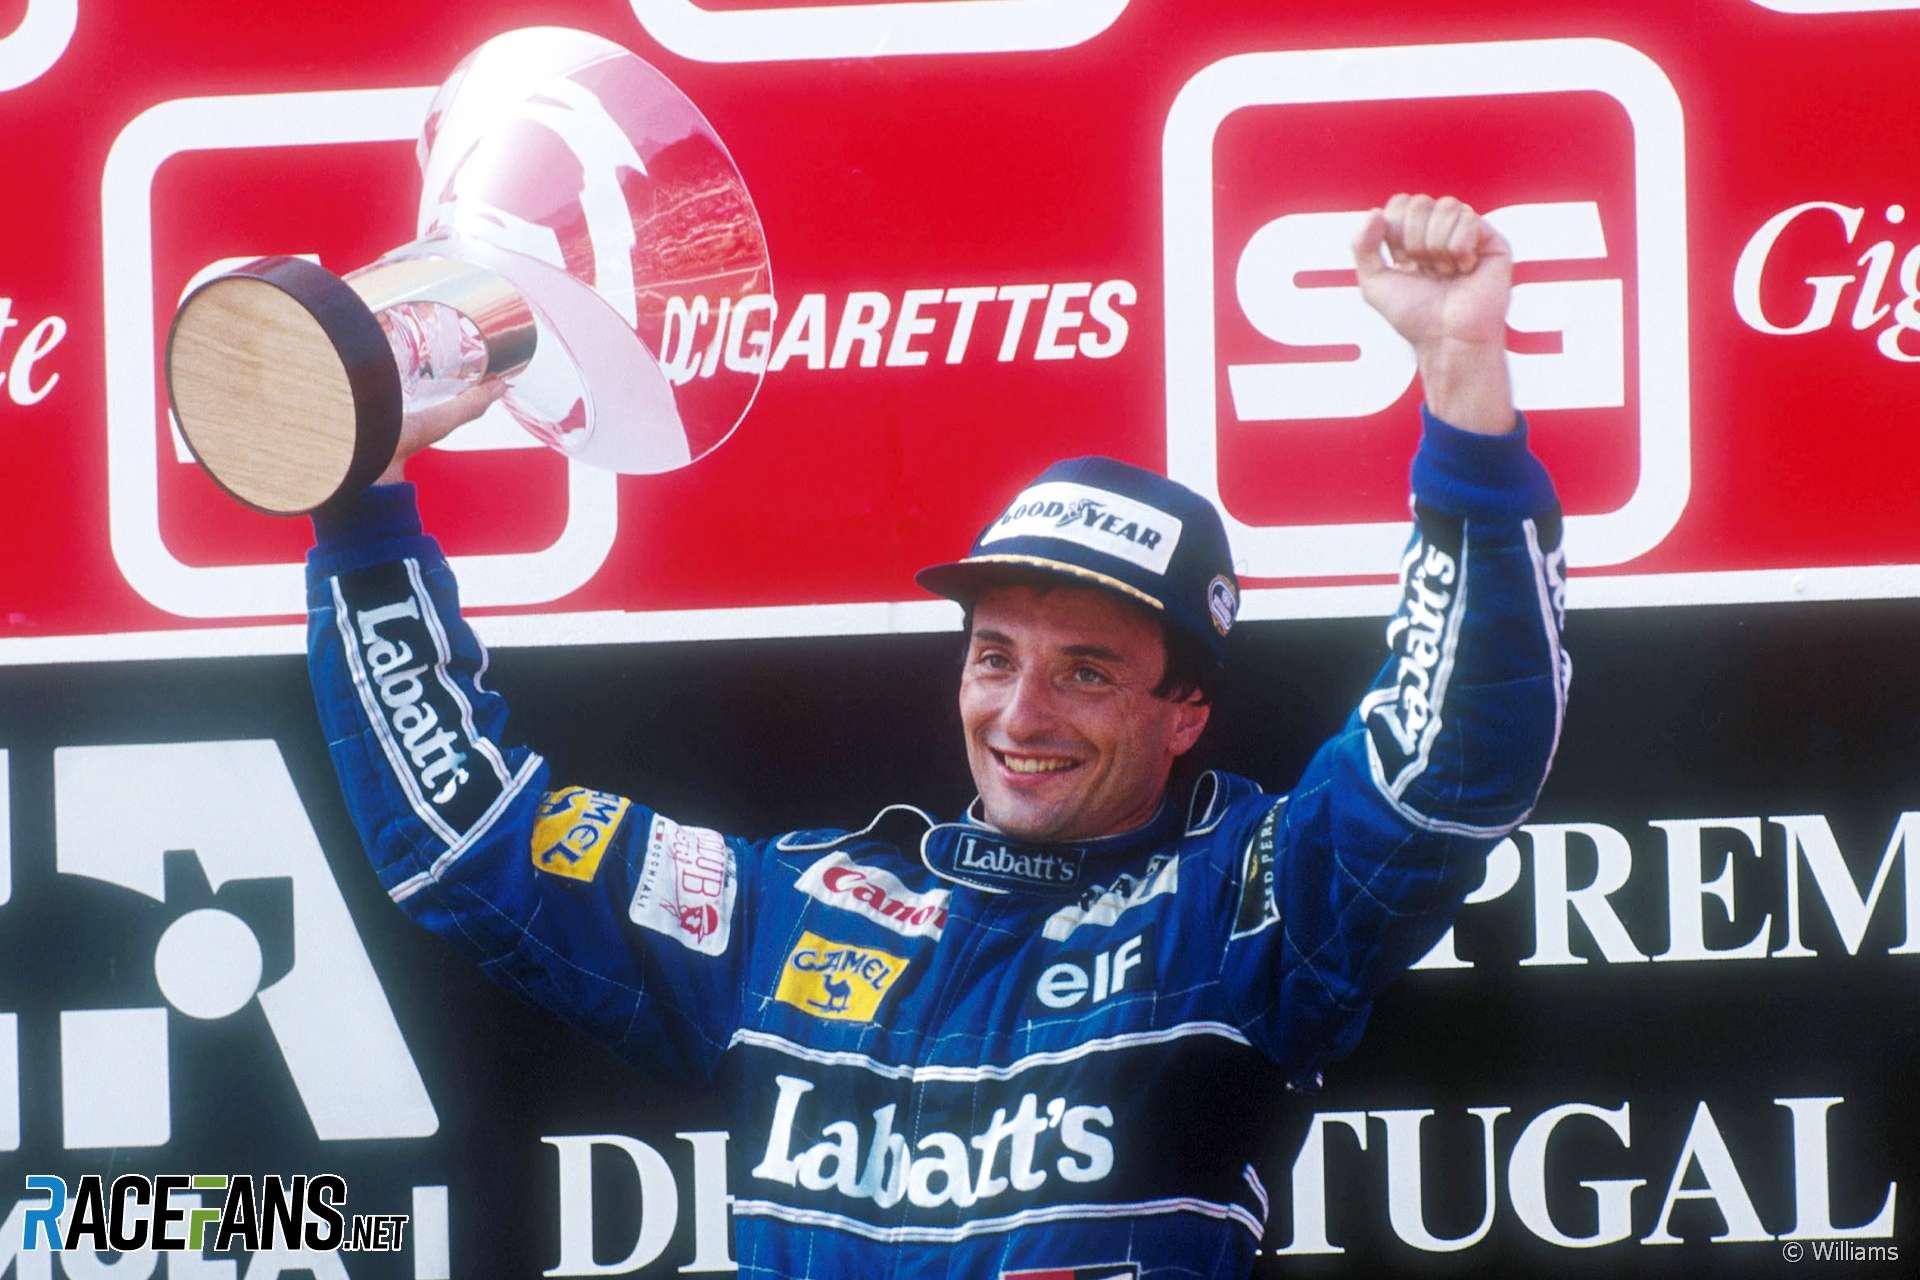 Ricciardo Patrese, Williams, Estoril, 1991